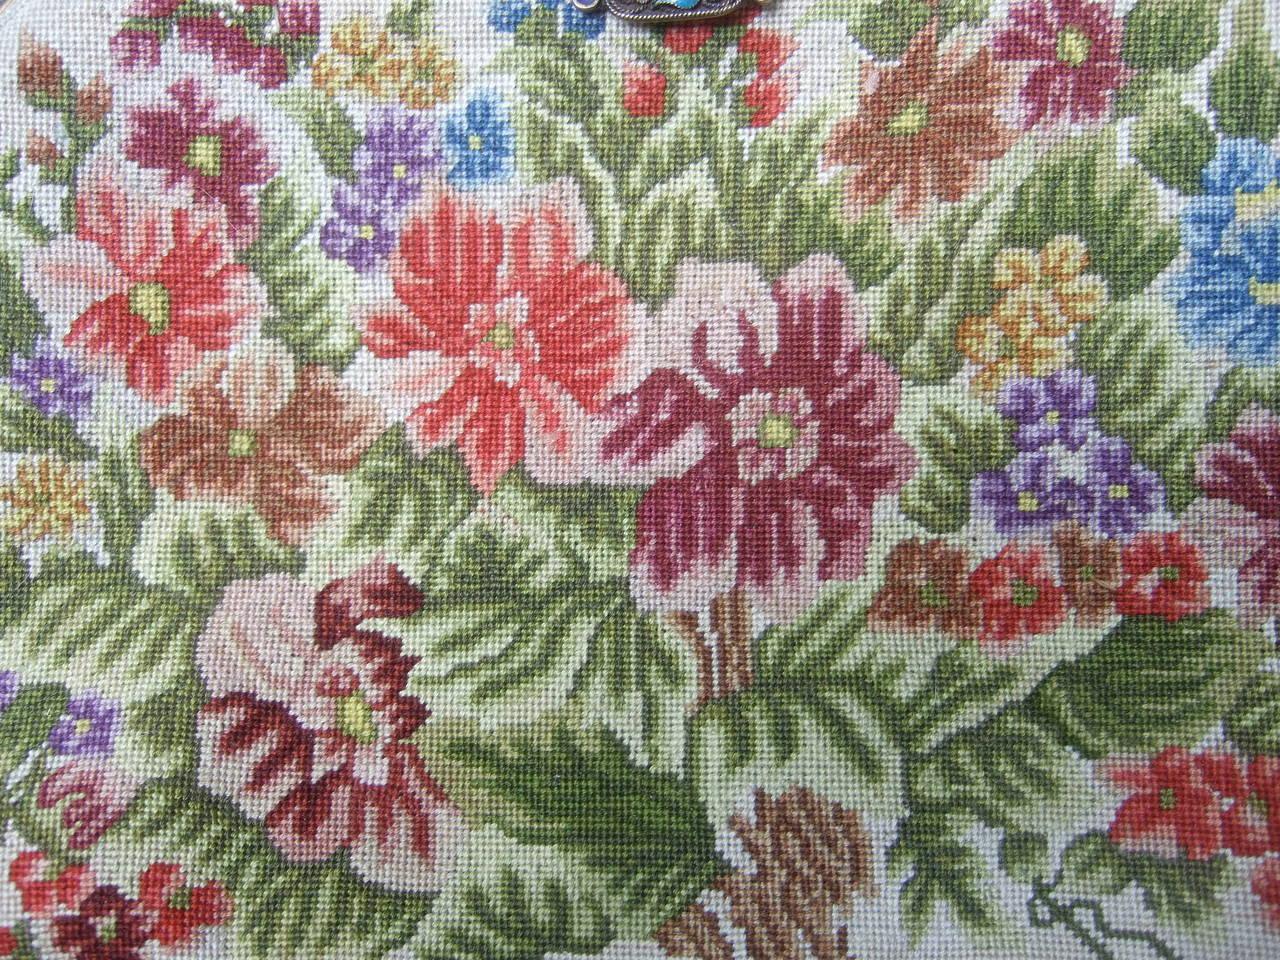 d3d5e08a0ead6 Exquisite Petit Point Jeweled Floral Evening Bag. 1920s For Sale at ...